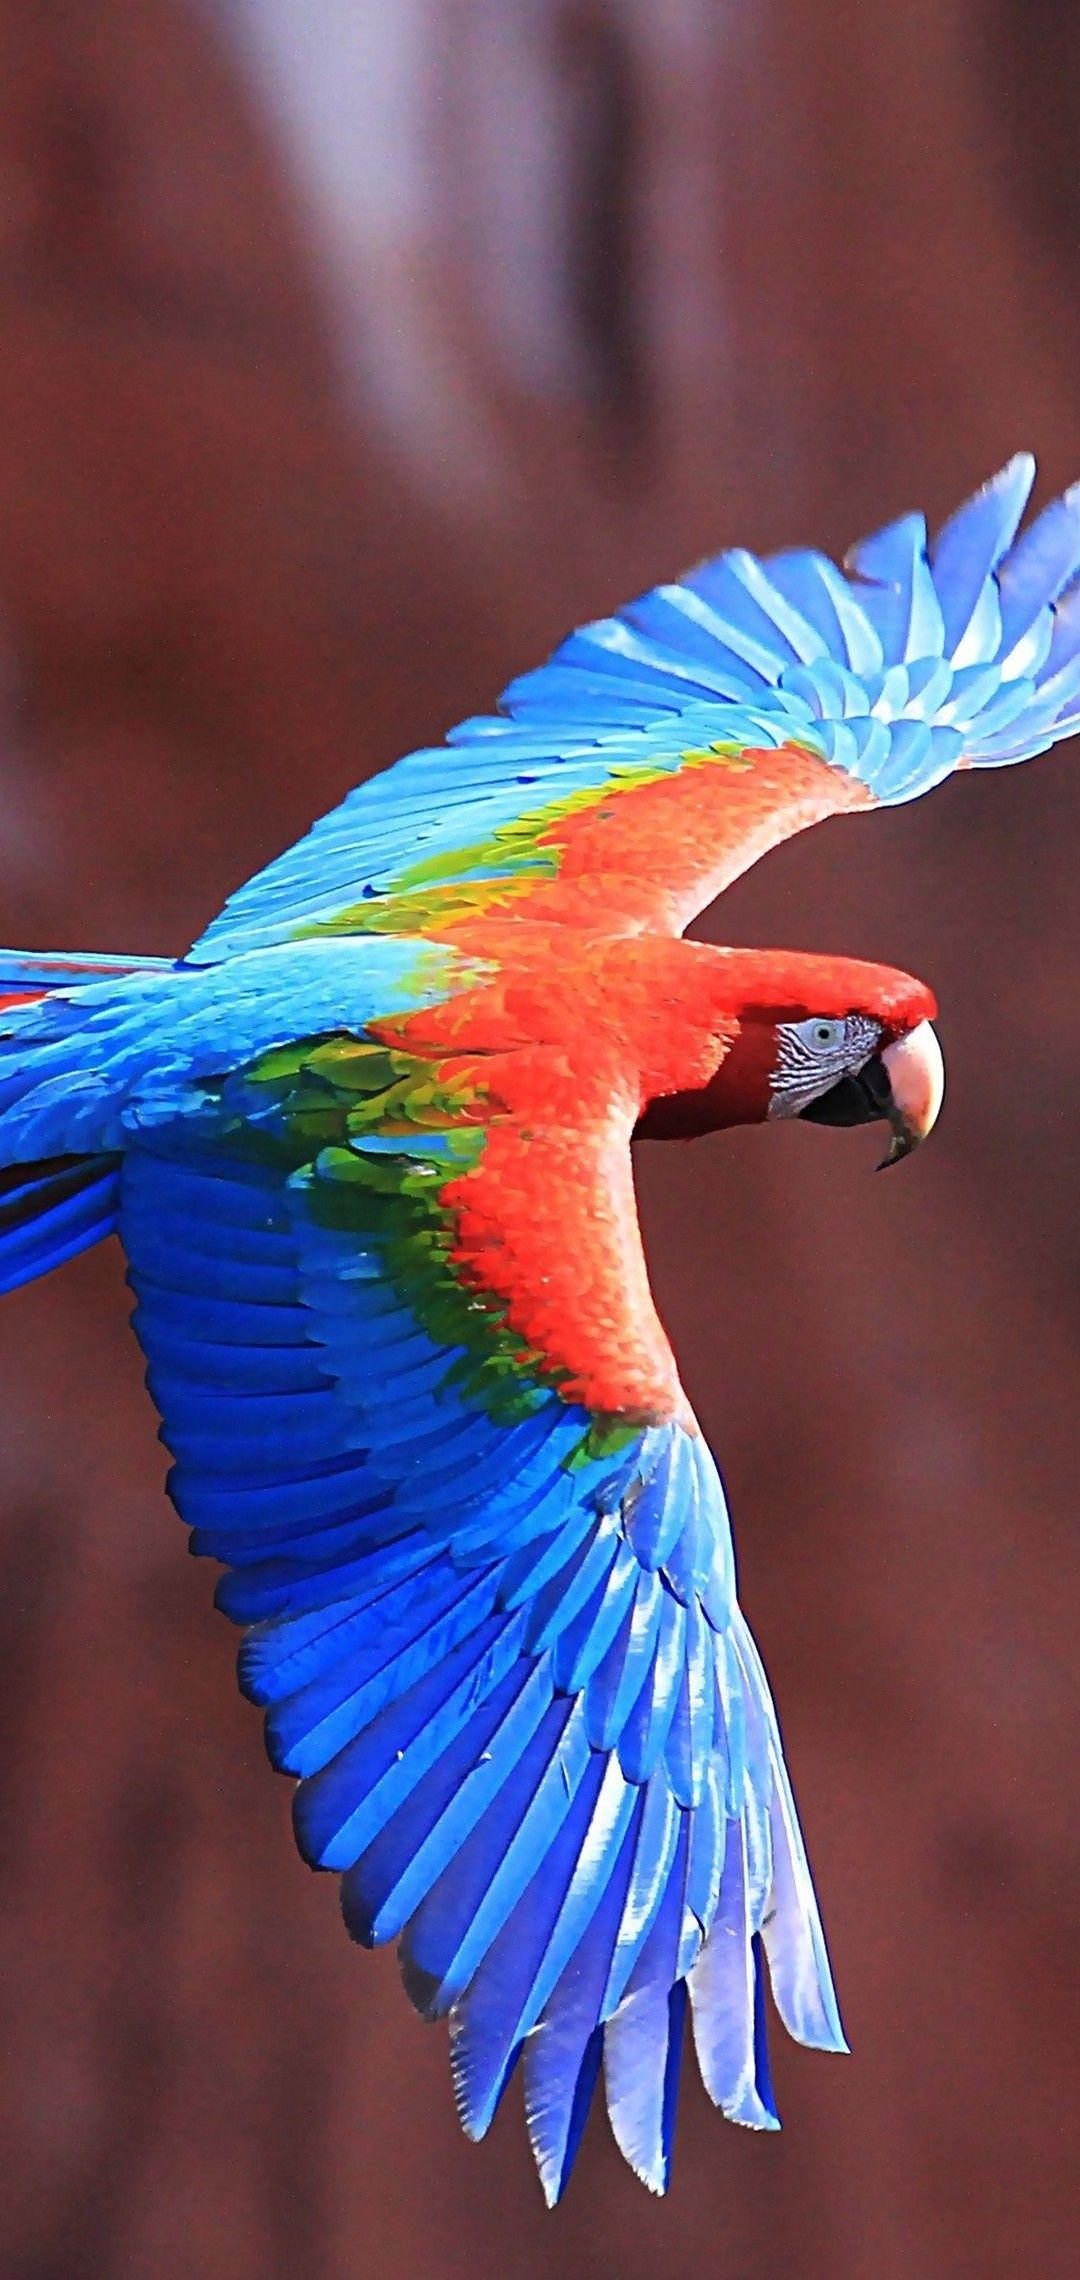 RedAndGreen Macaw Wallpaper x ParrotsMacaws in